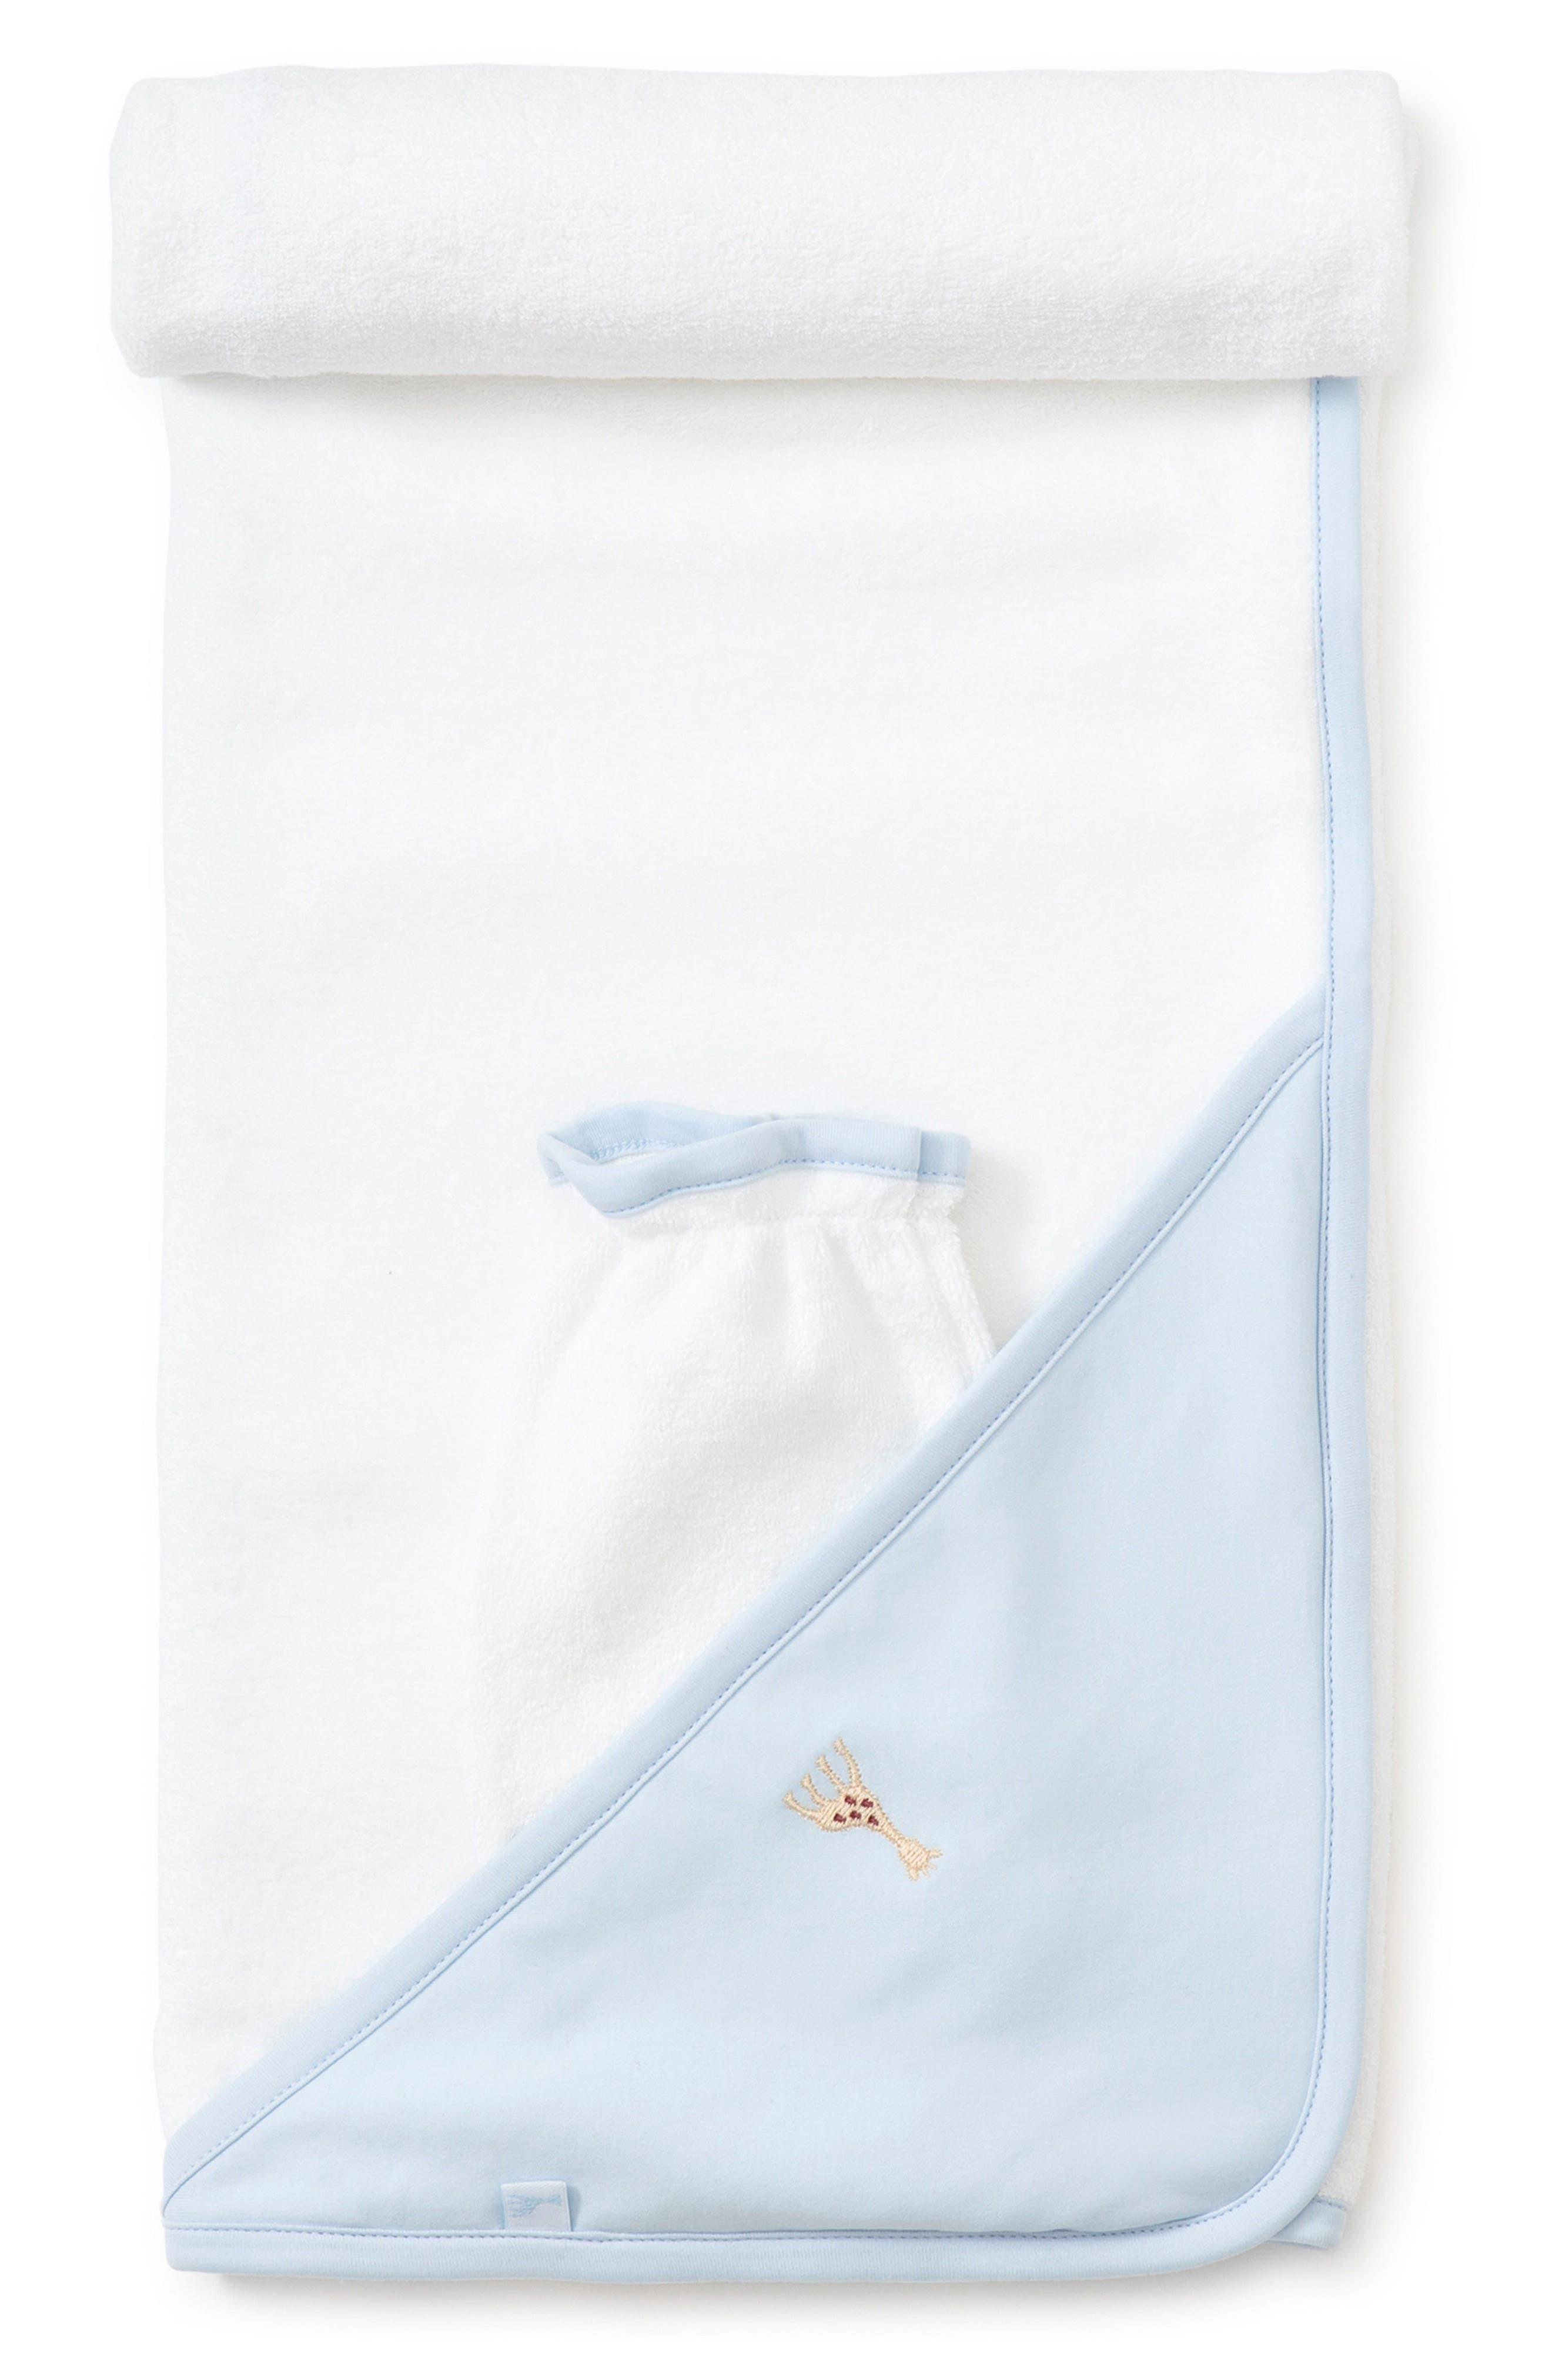 x Sophie la Girafe Hooded Towel & Bath Mitt Set,                             Main thumbnail 1, color,                             White/ Light Blue